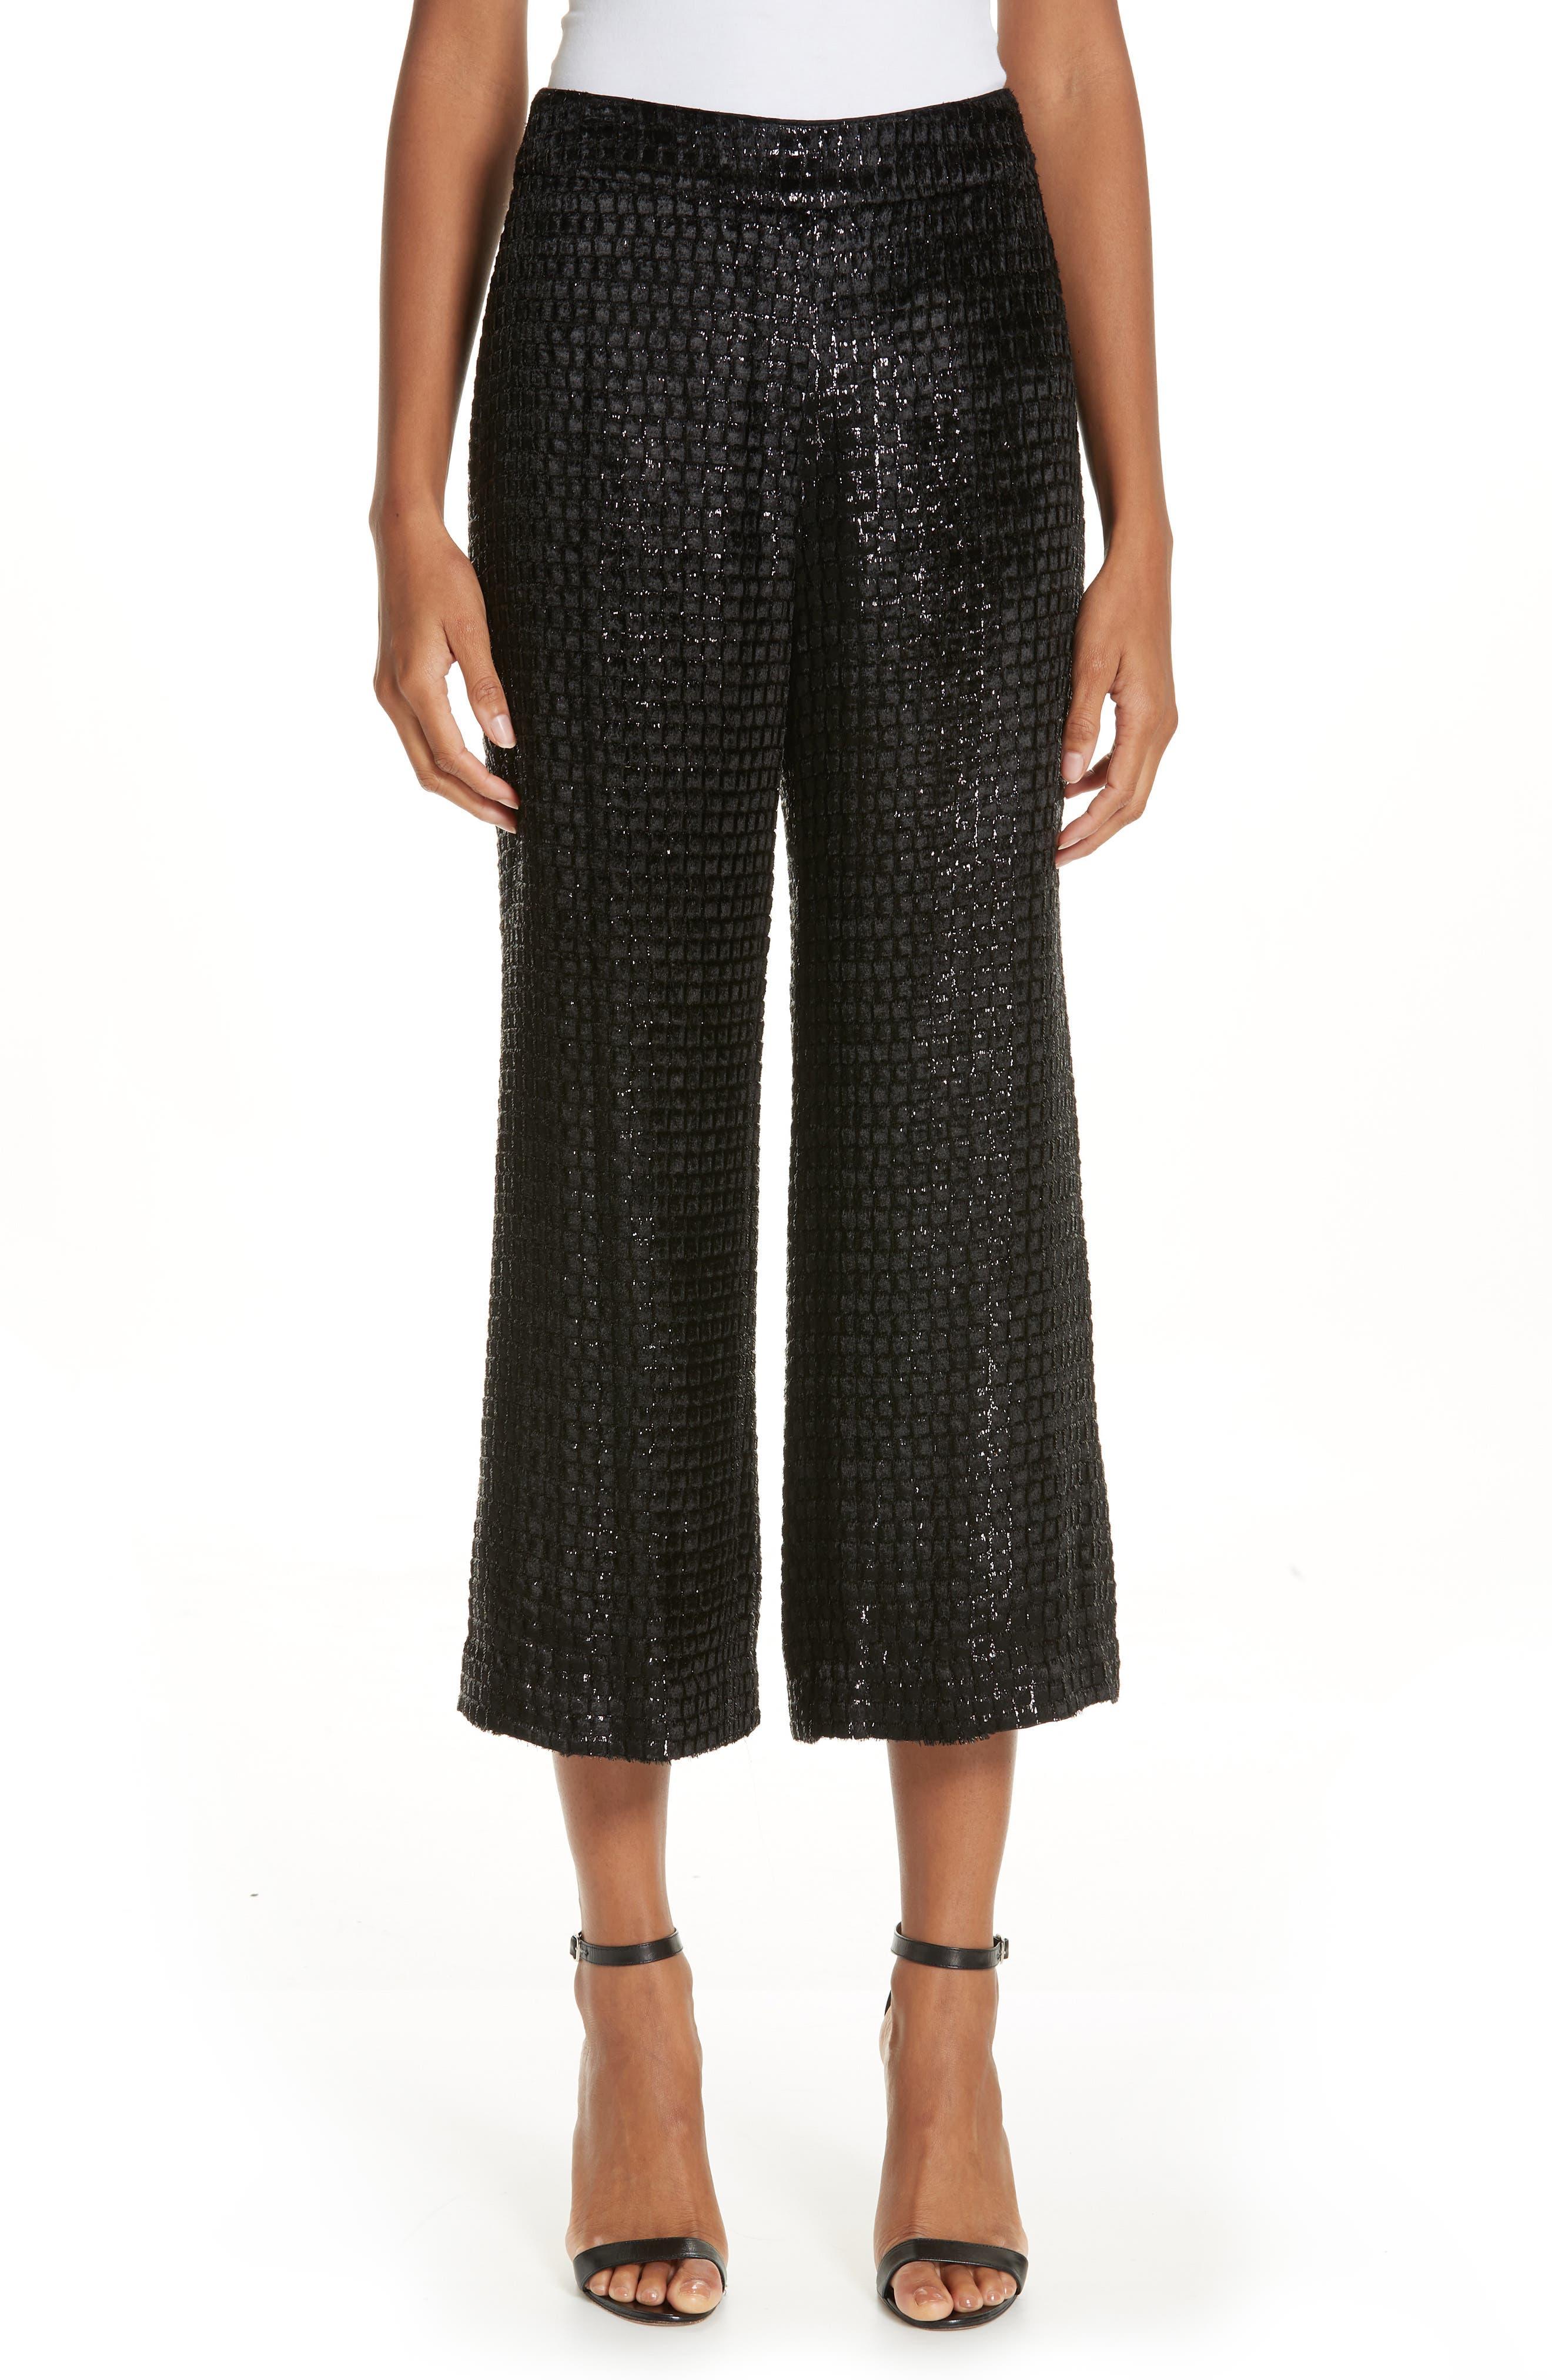 BRANDON MAXWELL, Metallic Velvet Crop Wide Leg Pants, Main thumbnail 1, color, BLACK